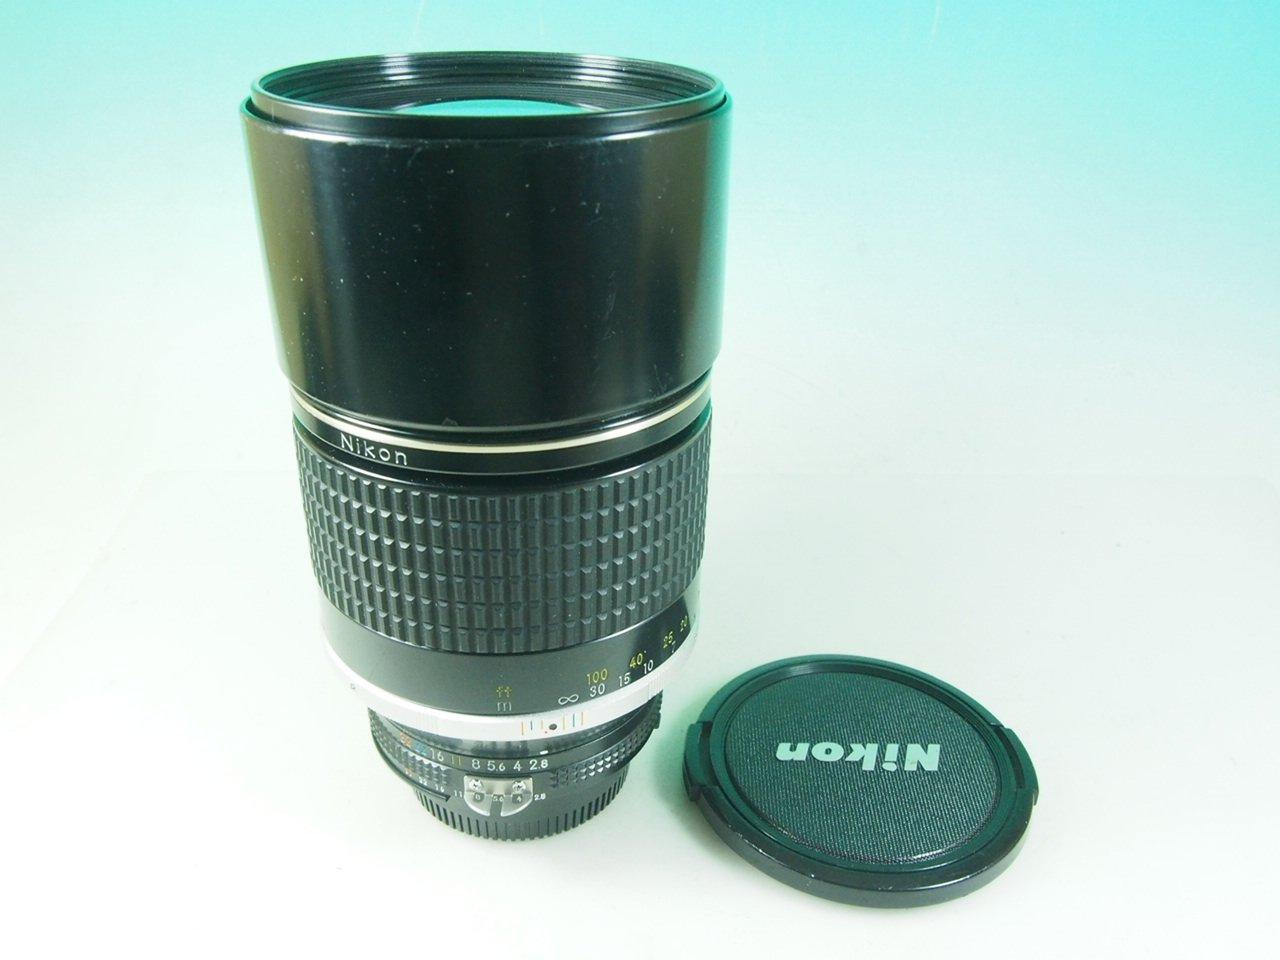 当社の Nikon MFレンズ Nikon Ai B008Q0X0U8 180mm 180mm F2.8s B008Q0X0U8, アガノシ:2bb4aaed --- pizzaovens4u.com